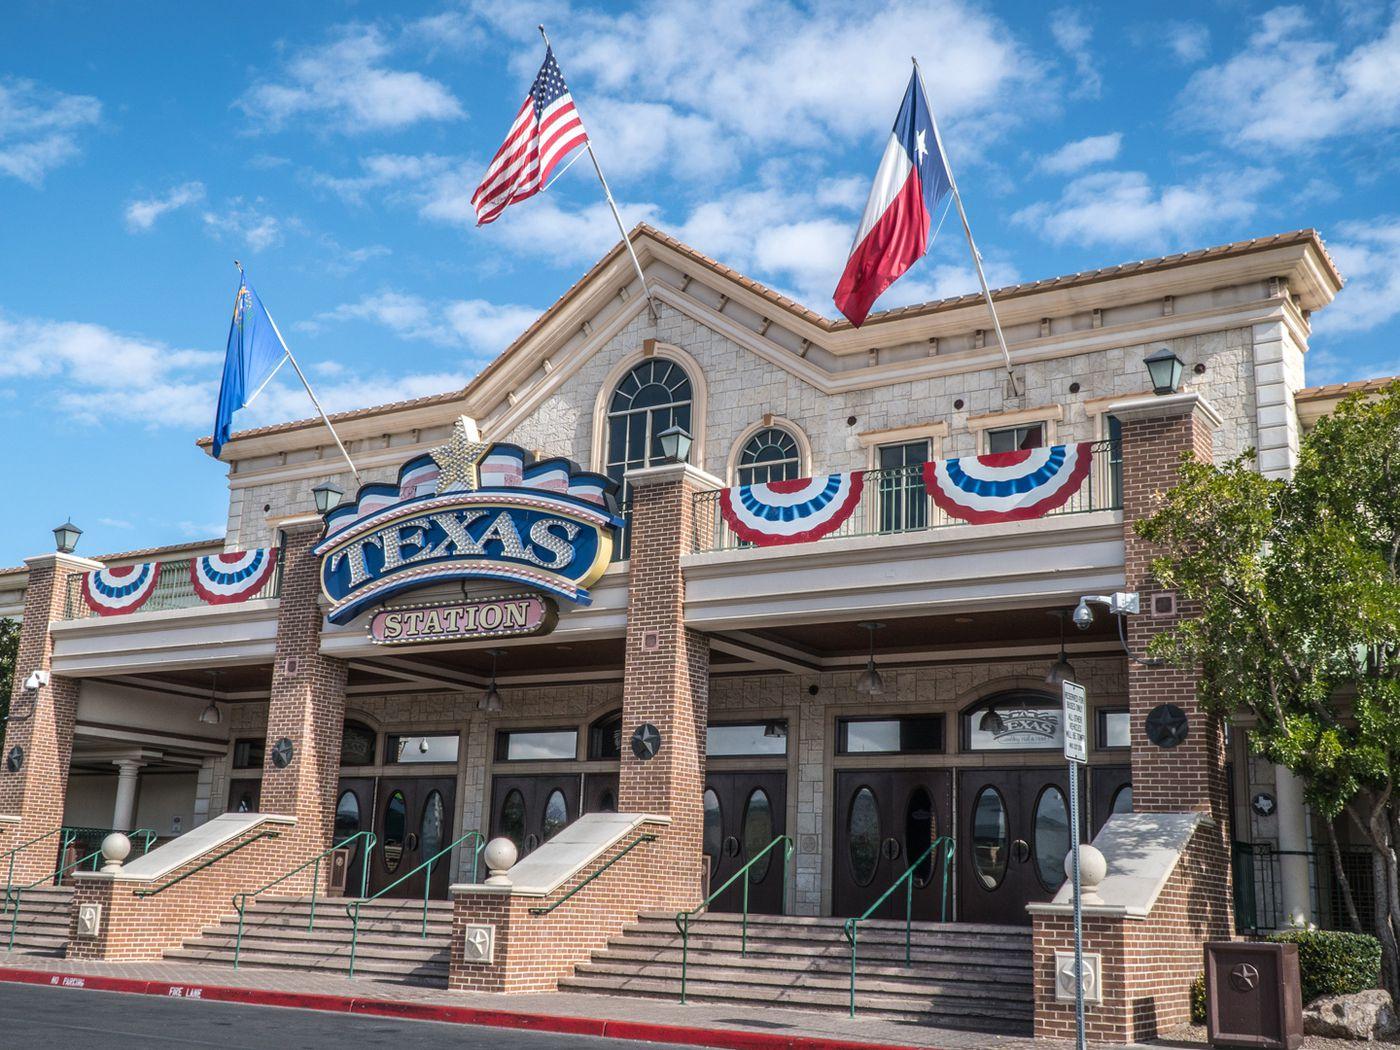 Texas casino north las vegas monster vs alien 2 games